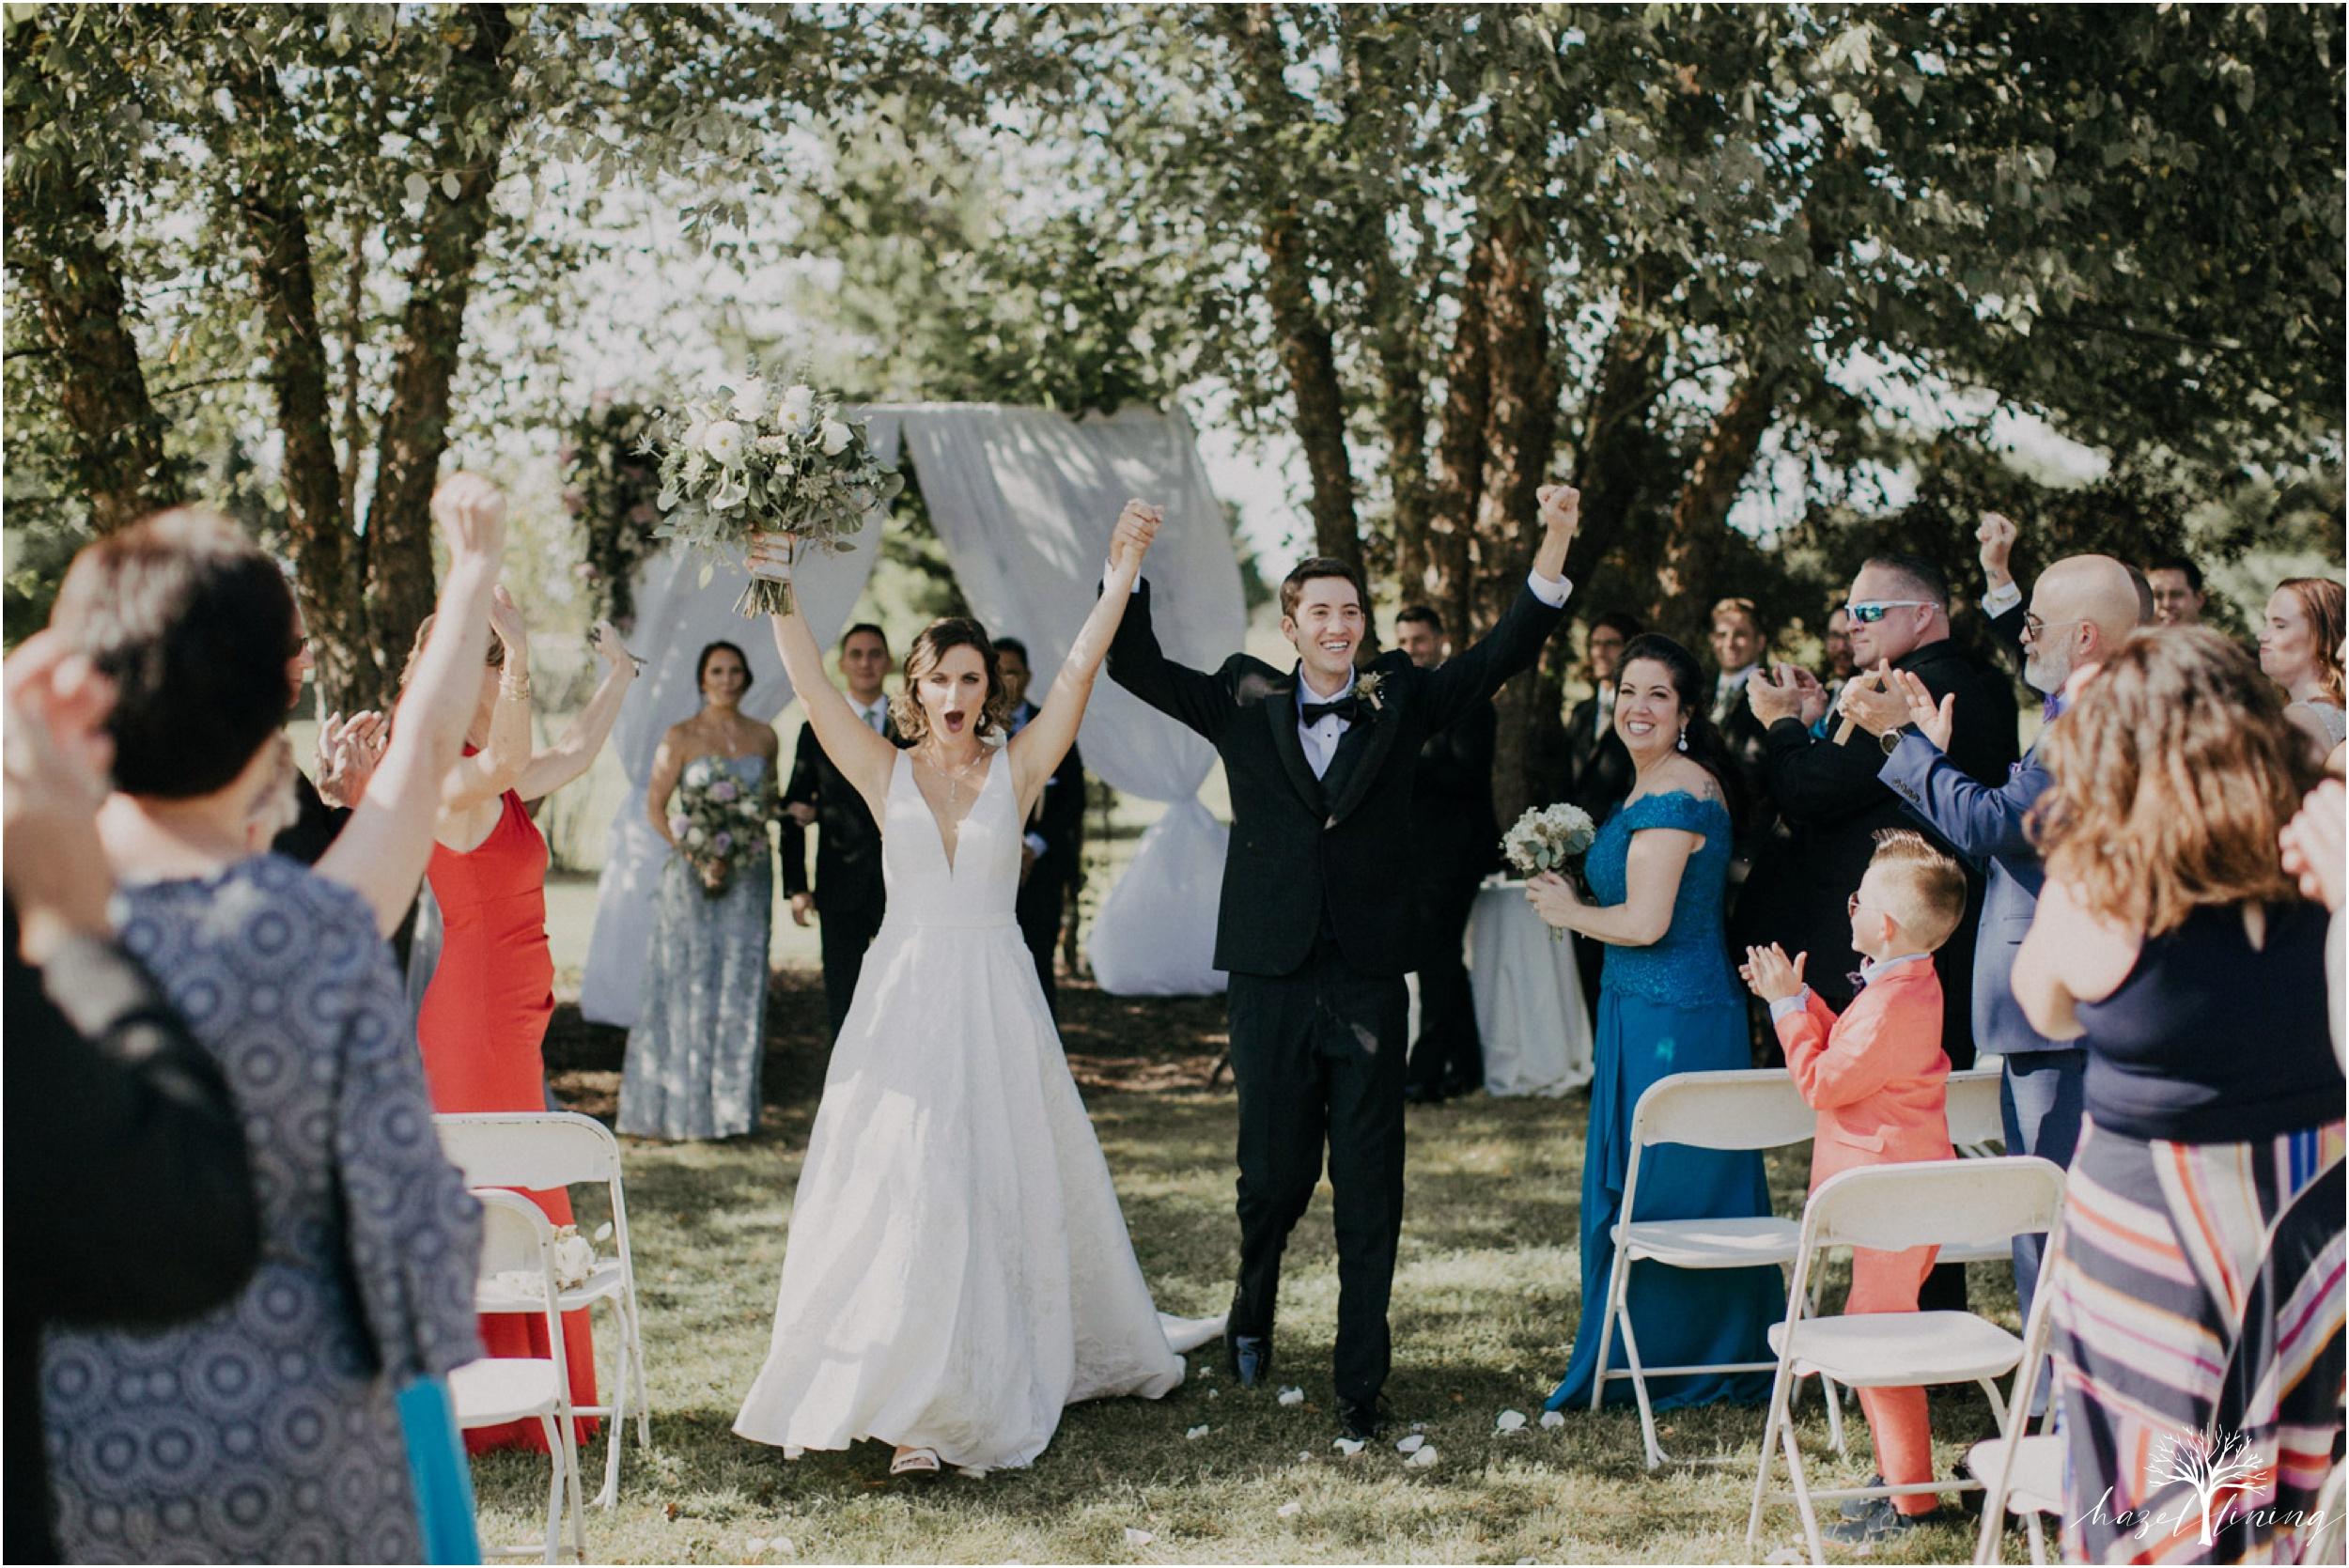 maureen-hepner-anthony-giordano-rose-bank-winery-newtow-pennsylvania-luxury-summer-wedding-hazel-lining-photography-destination-elopement-wedding-engagement-photography_0076.jpg